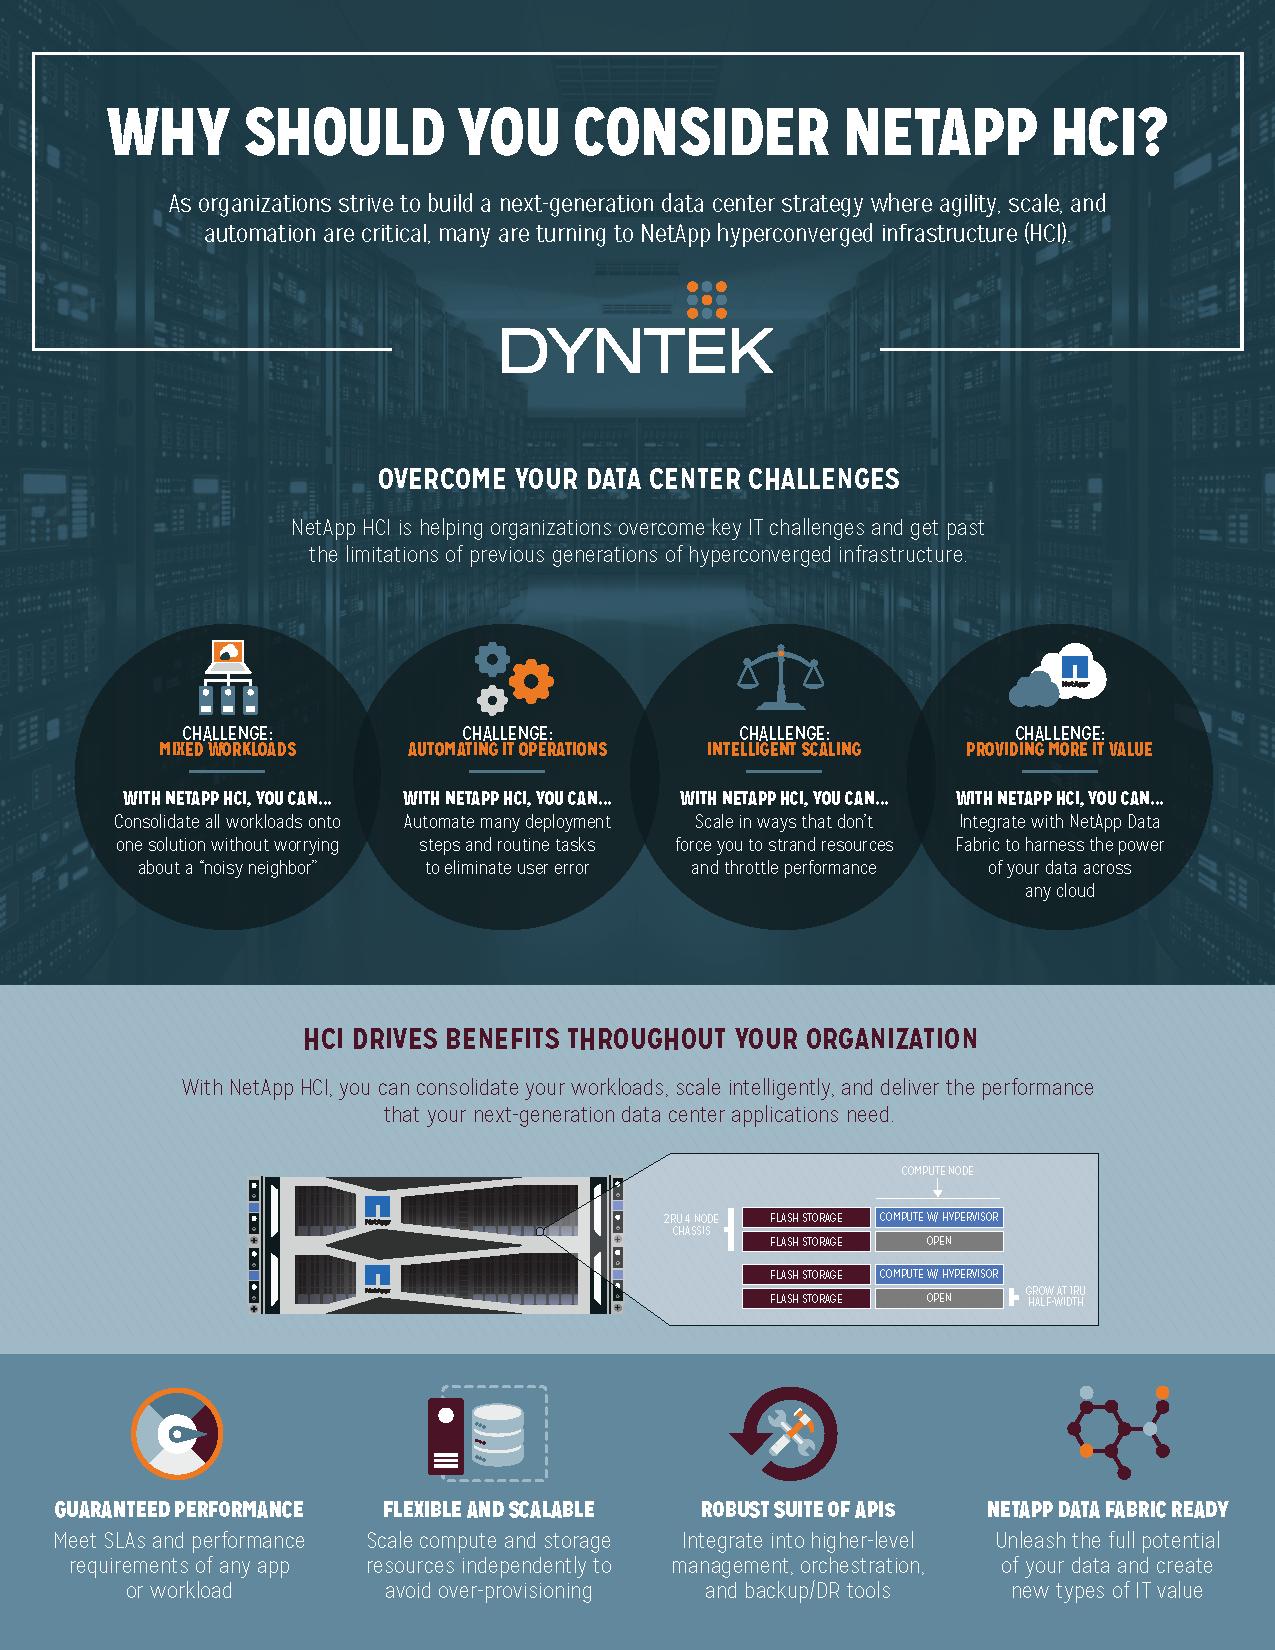 DynTek_HCI_INFOGRAPHIC_Page_1